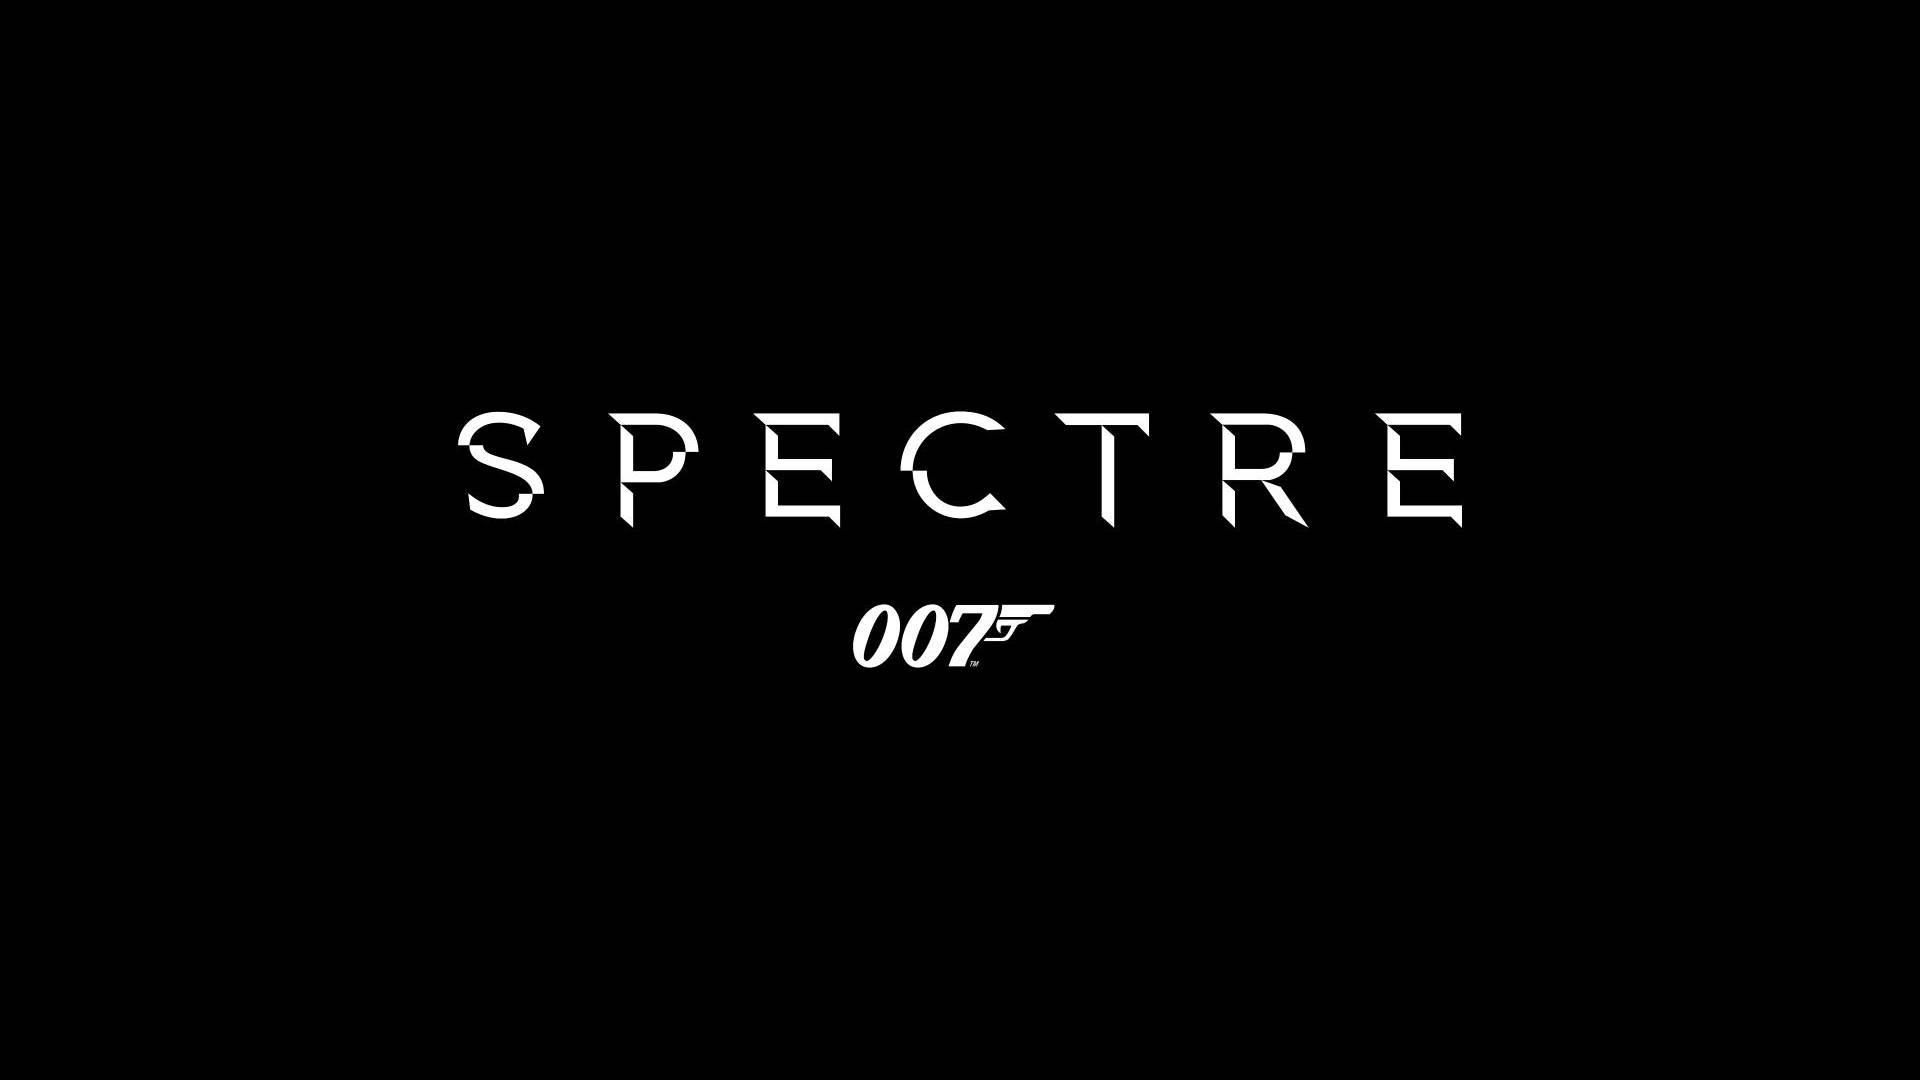 james-bond-spectre-logo.jpg